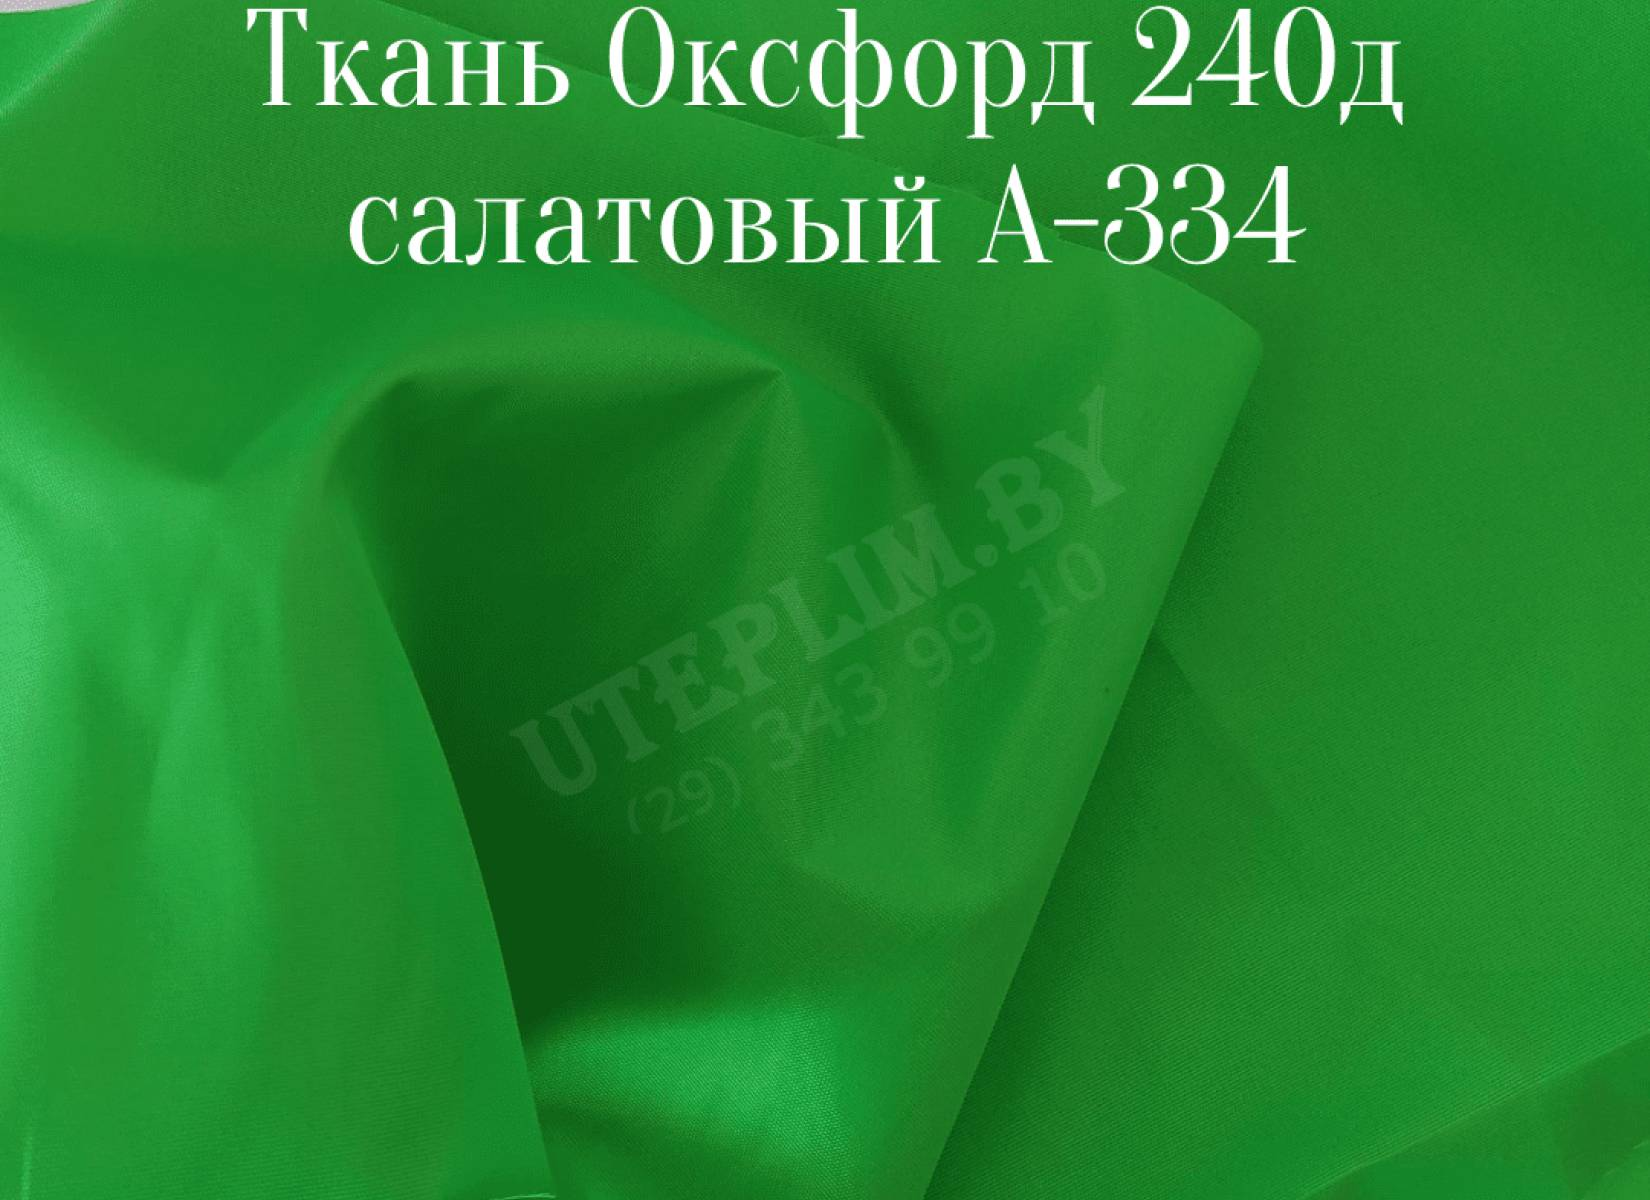 240д -салатвый А-334